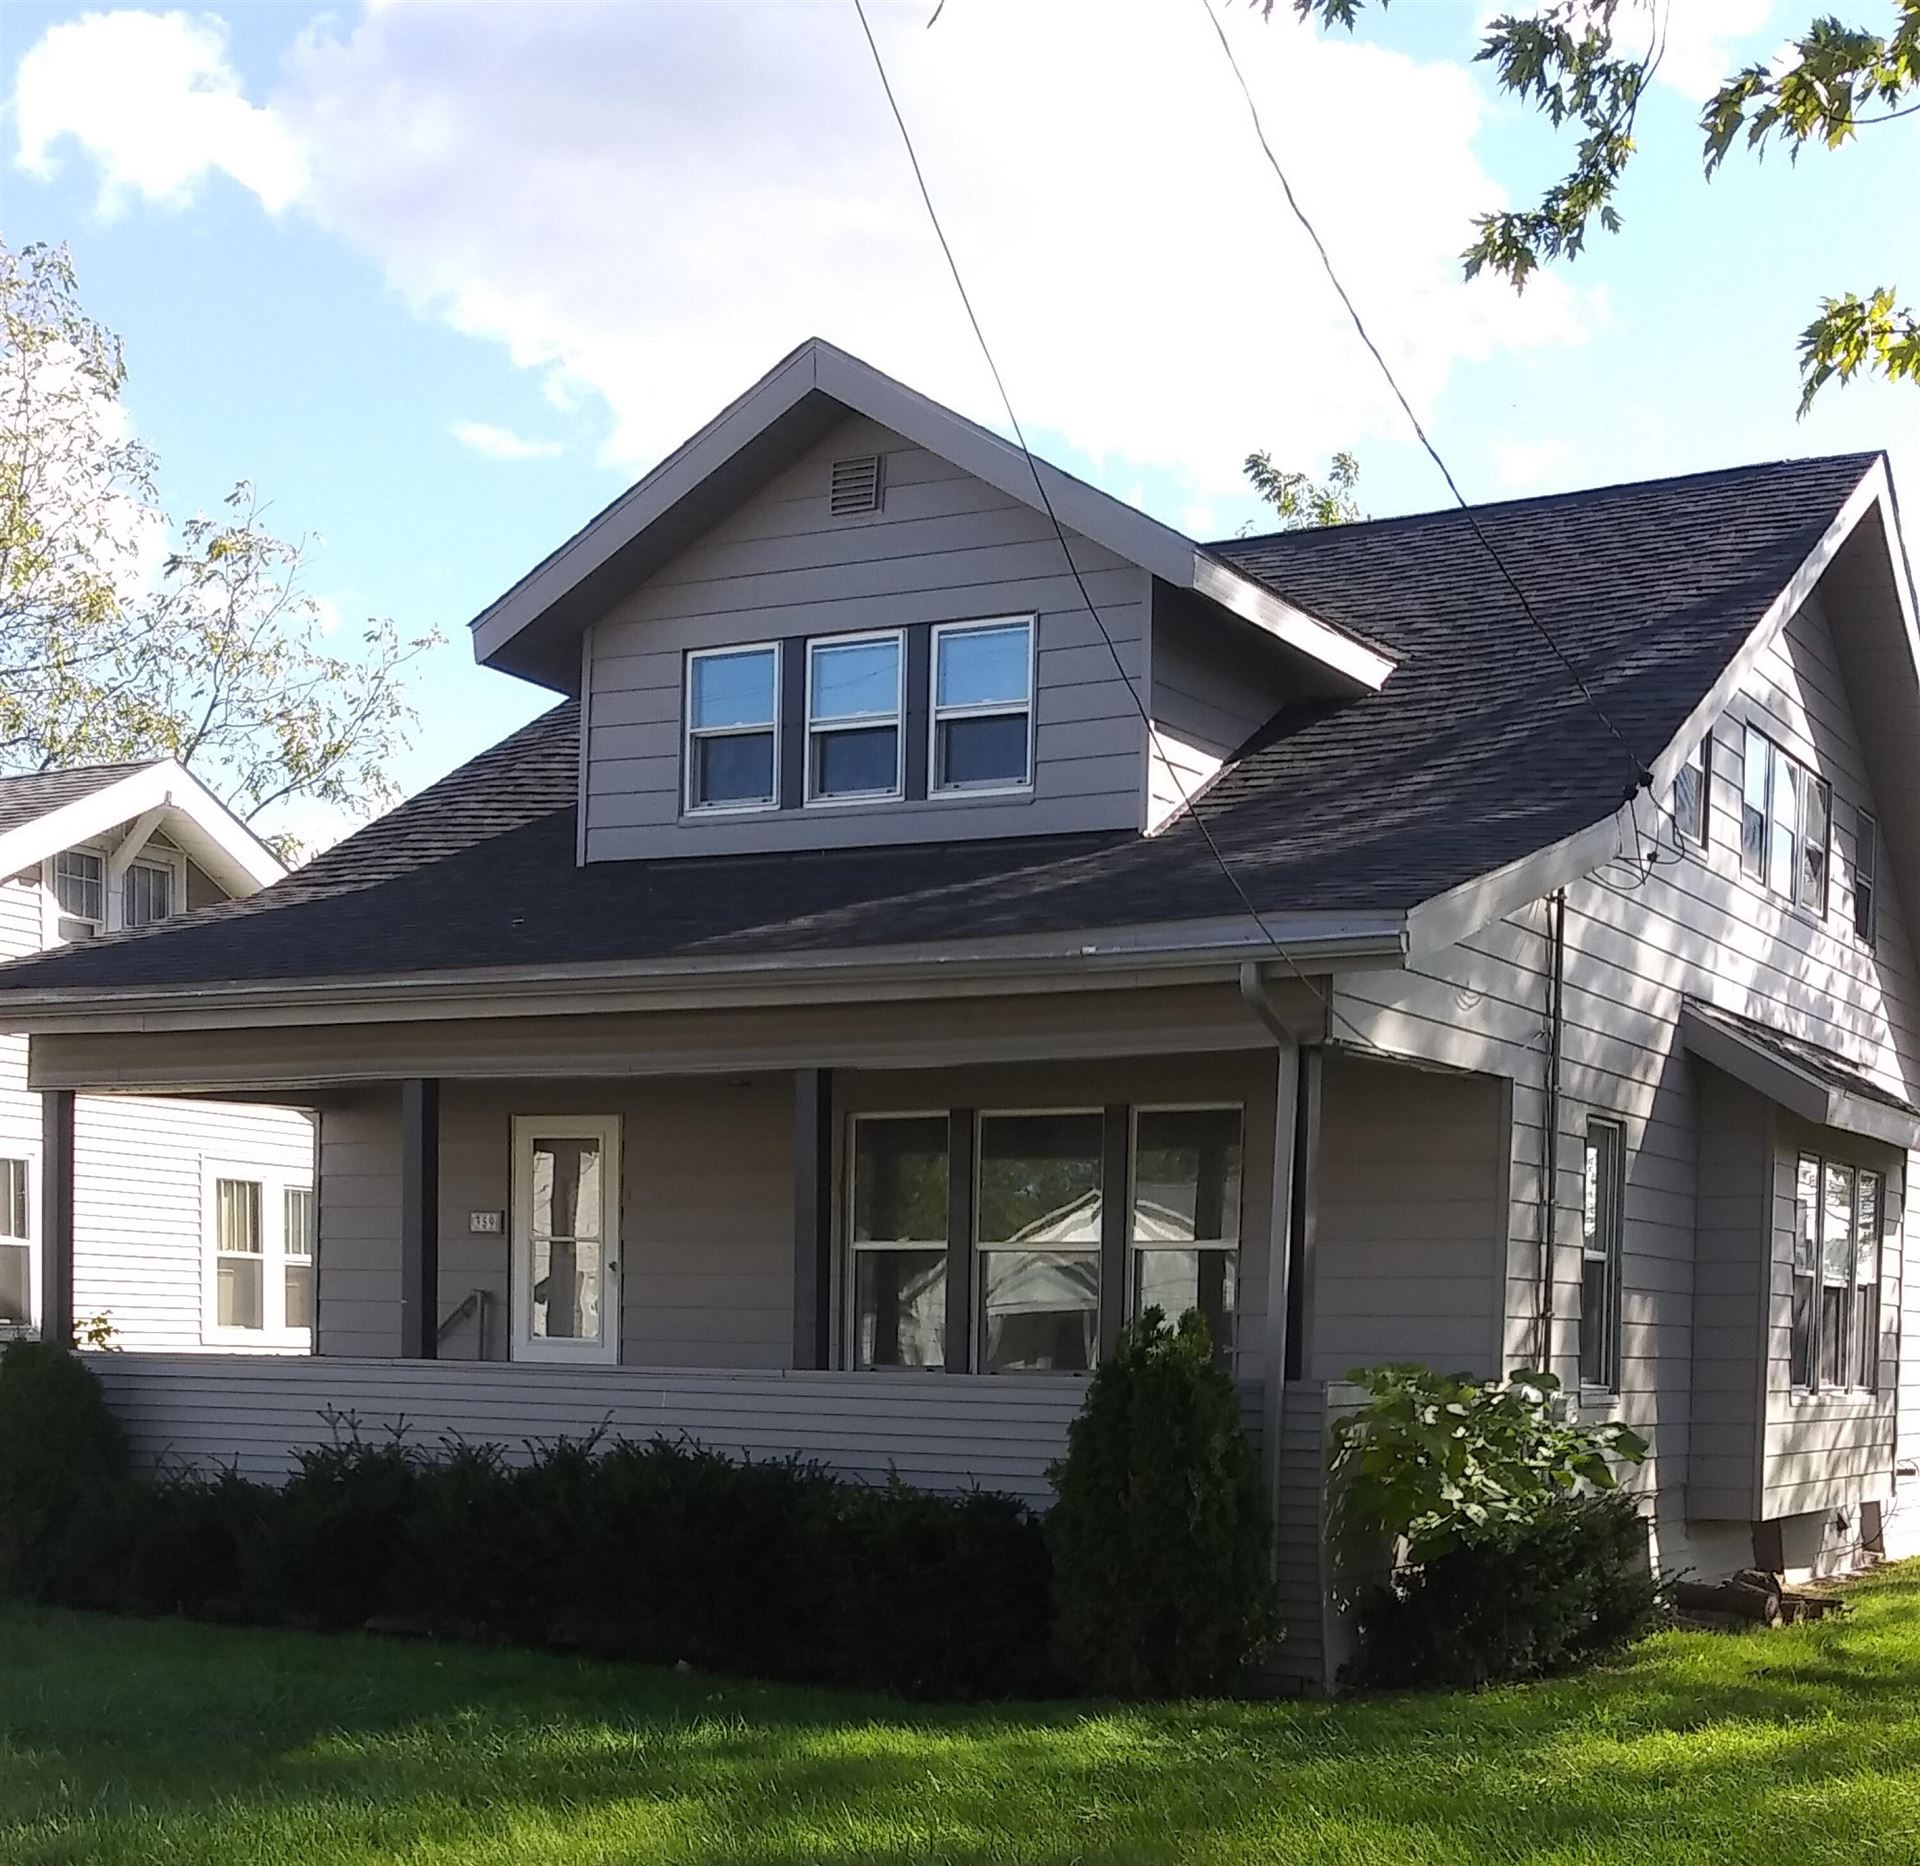 359 Lakeview Avenue, Battle Creek, MI 49015 - MLS#: 21111408